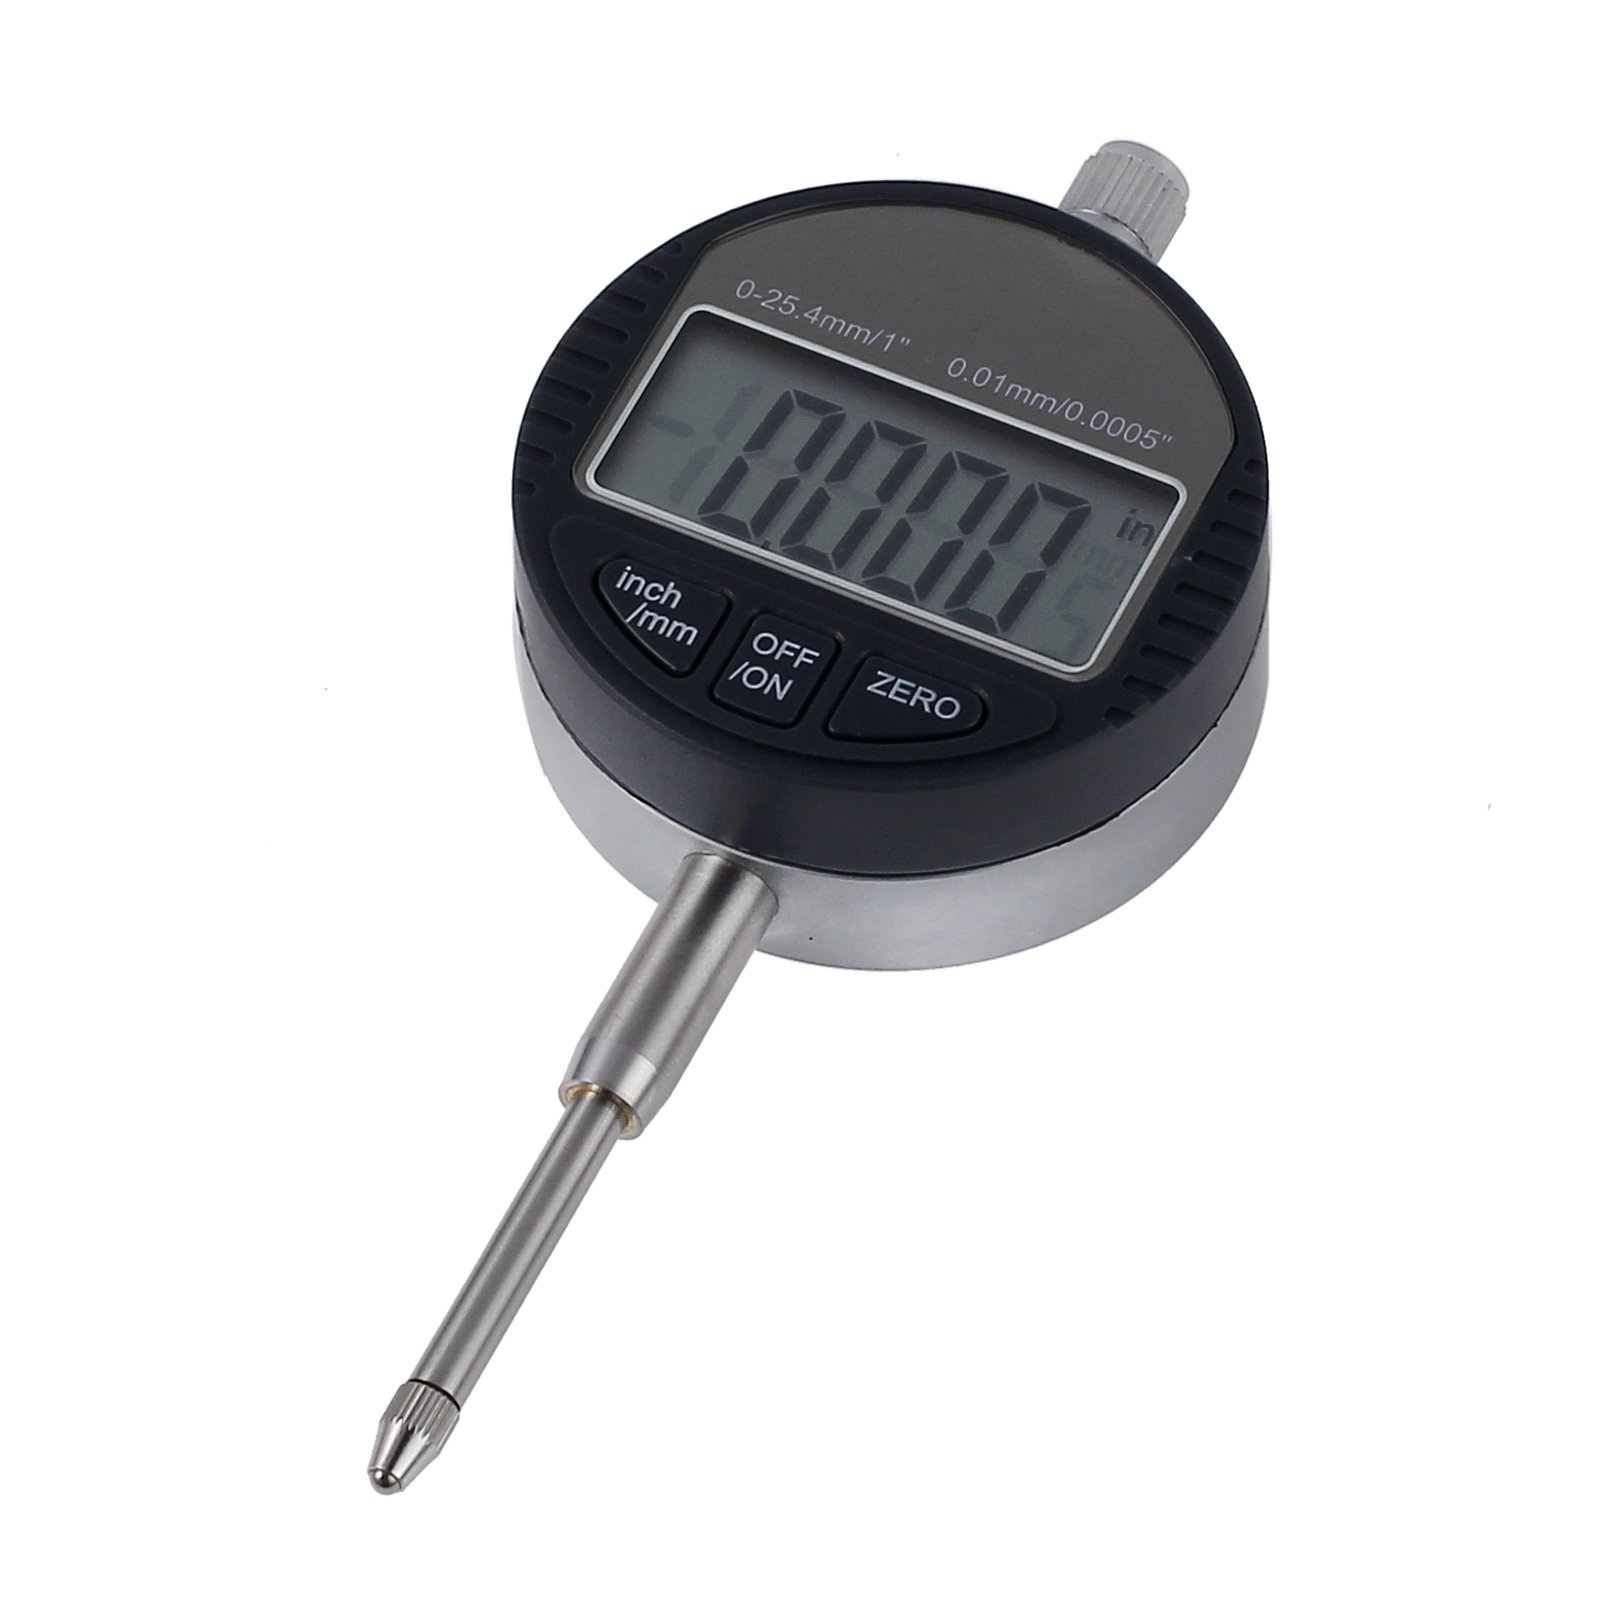 Proxima Direct Digital Dial Indicator DTI Digital Probe Indicator Dial Test Gauge 0.01mm/.0005'' Range 0-25.4mm/1'' Clock Gauge